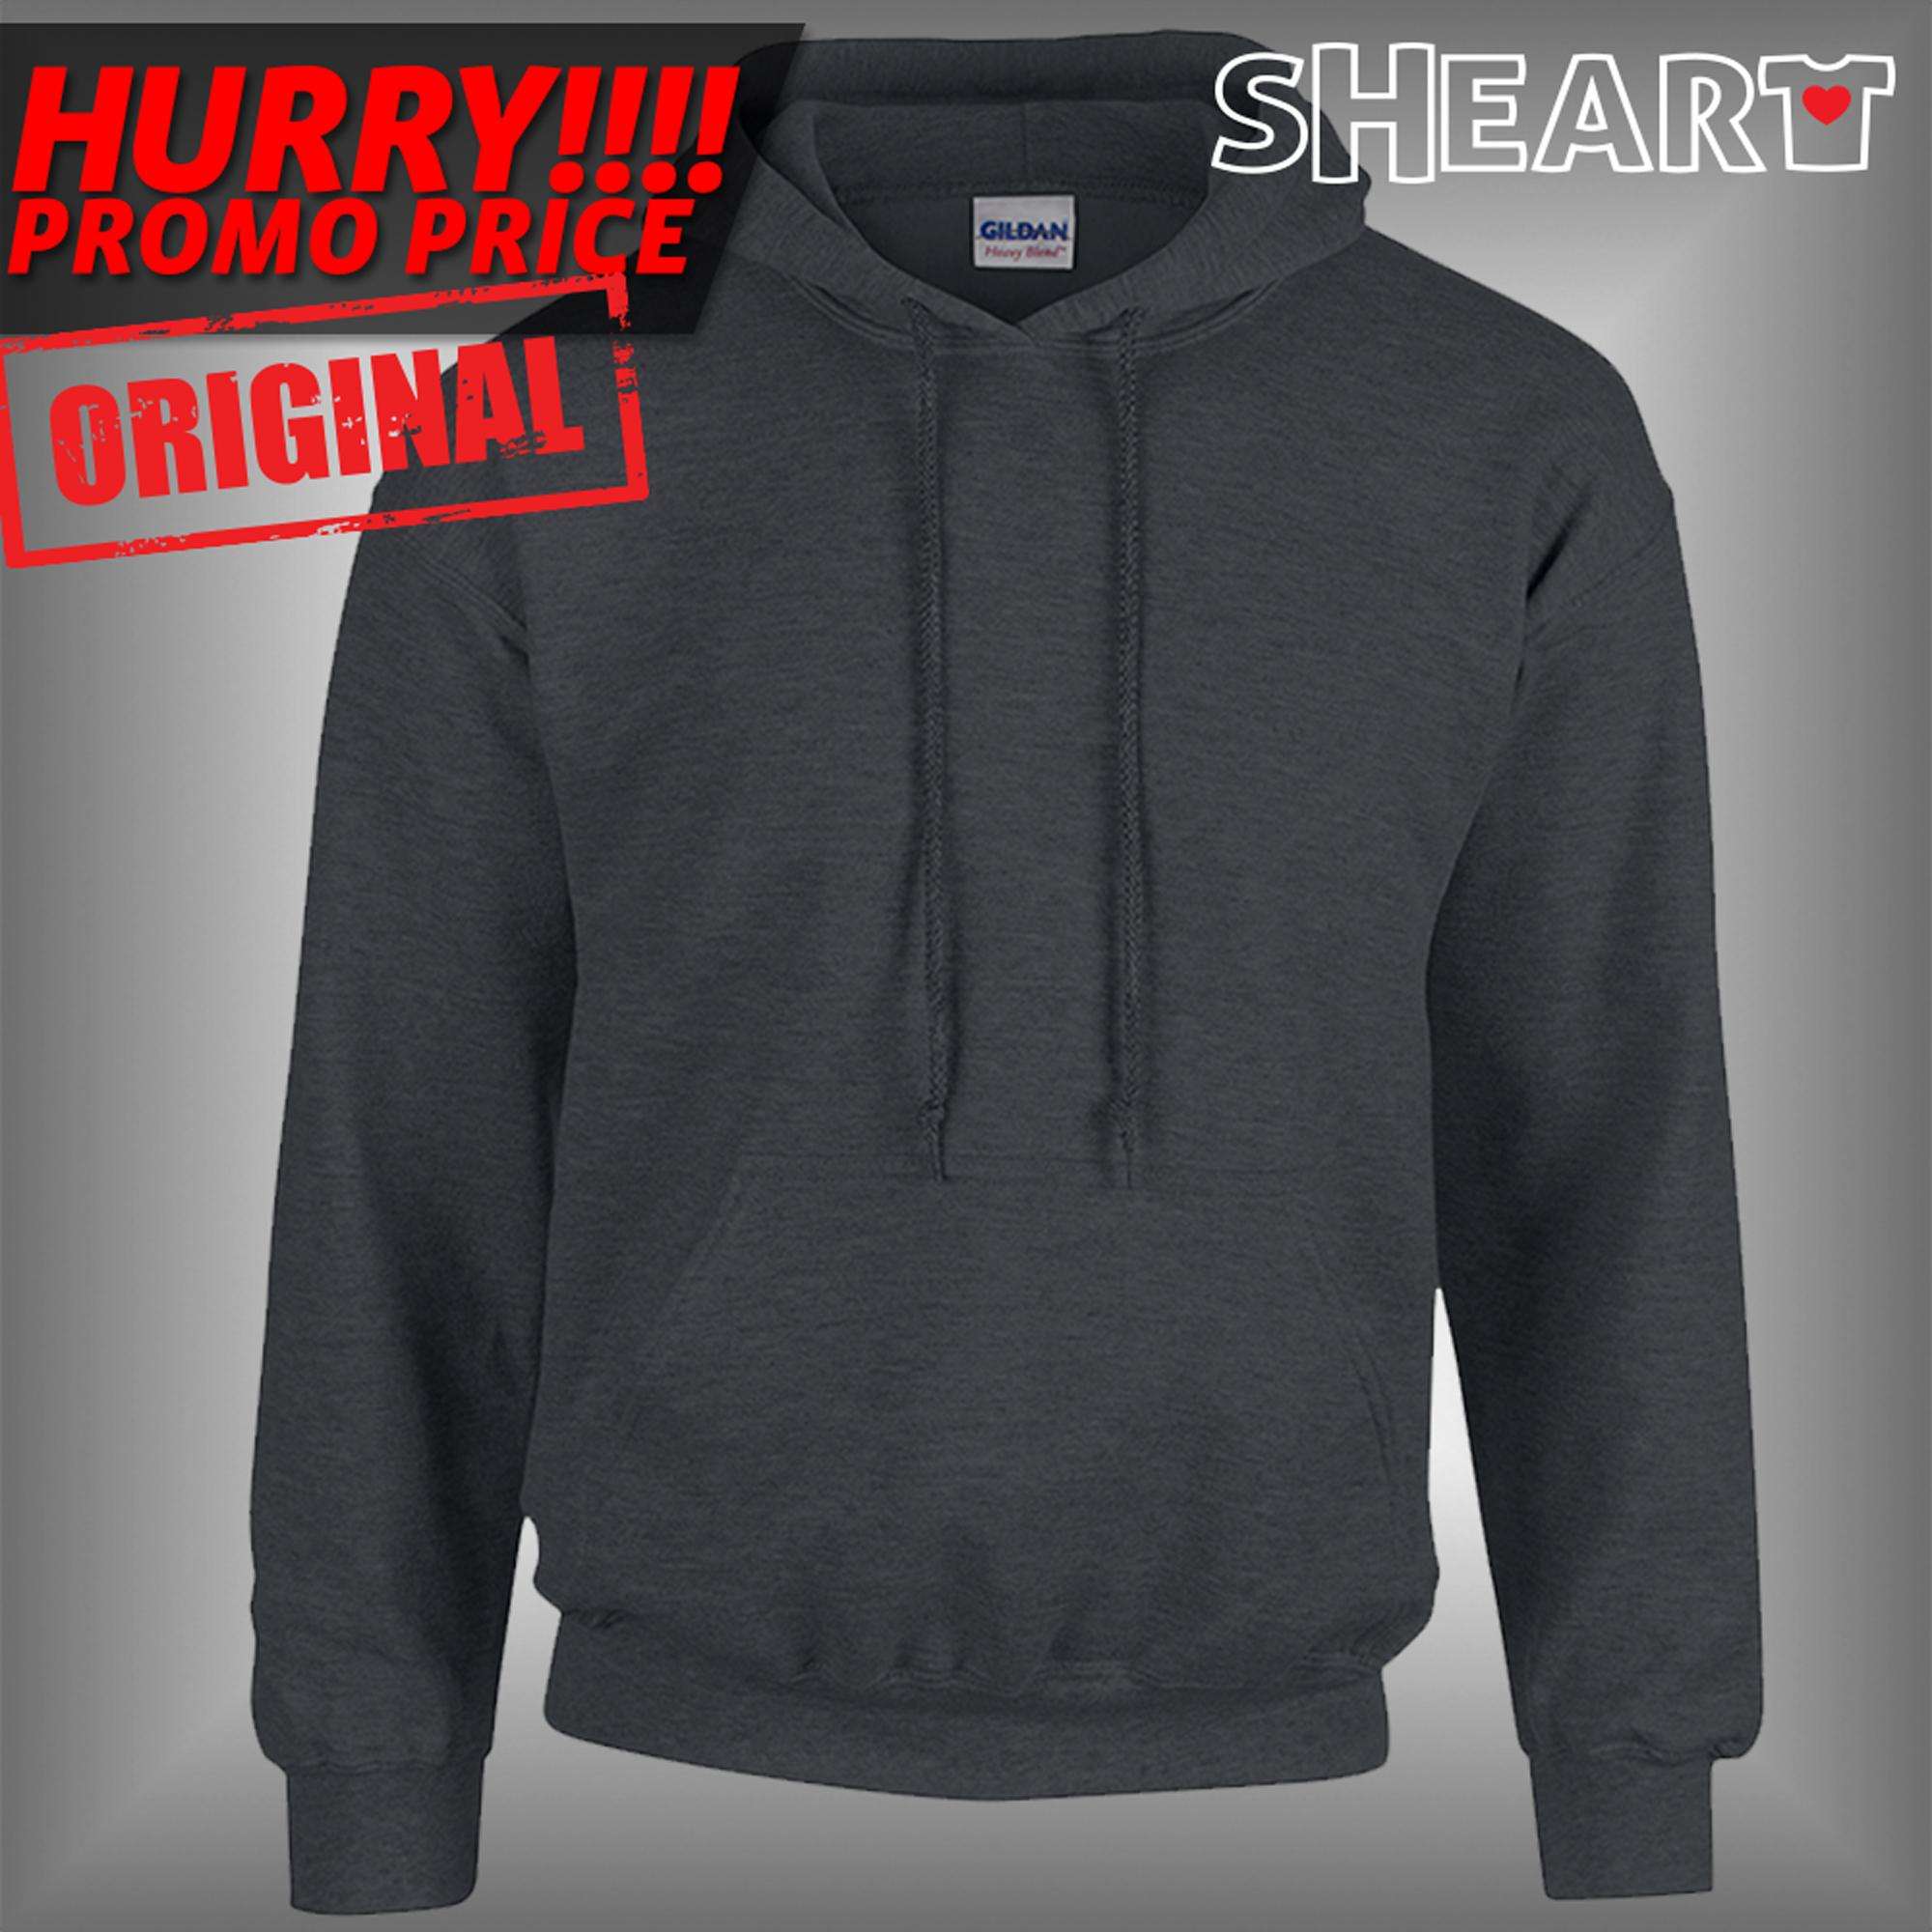 23d17c5066 Mens Hoodies for sale - Hoodie Jackets for Men online brands